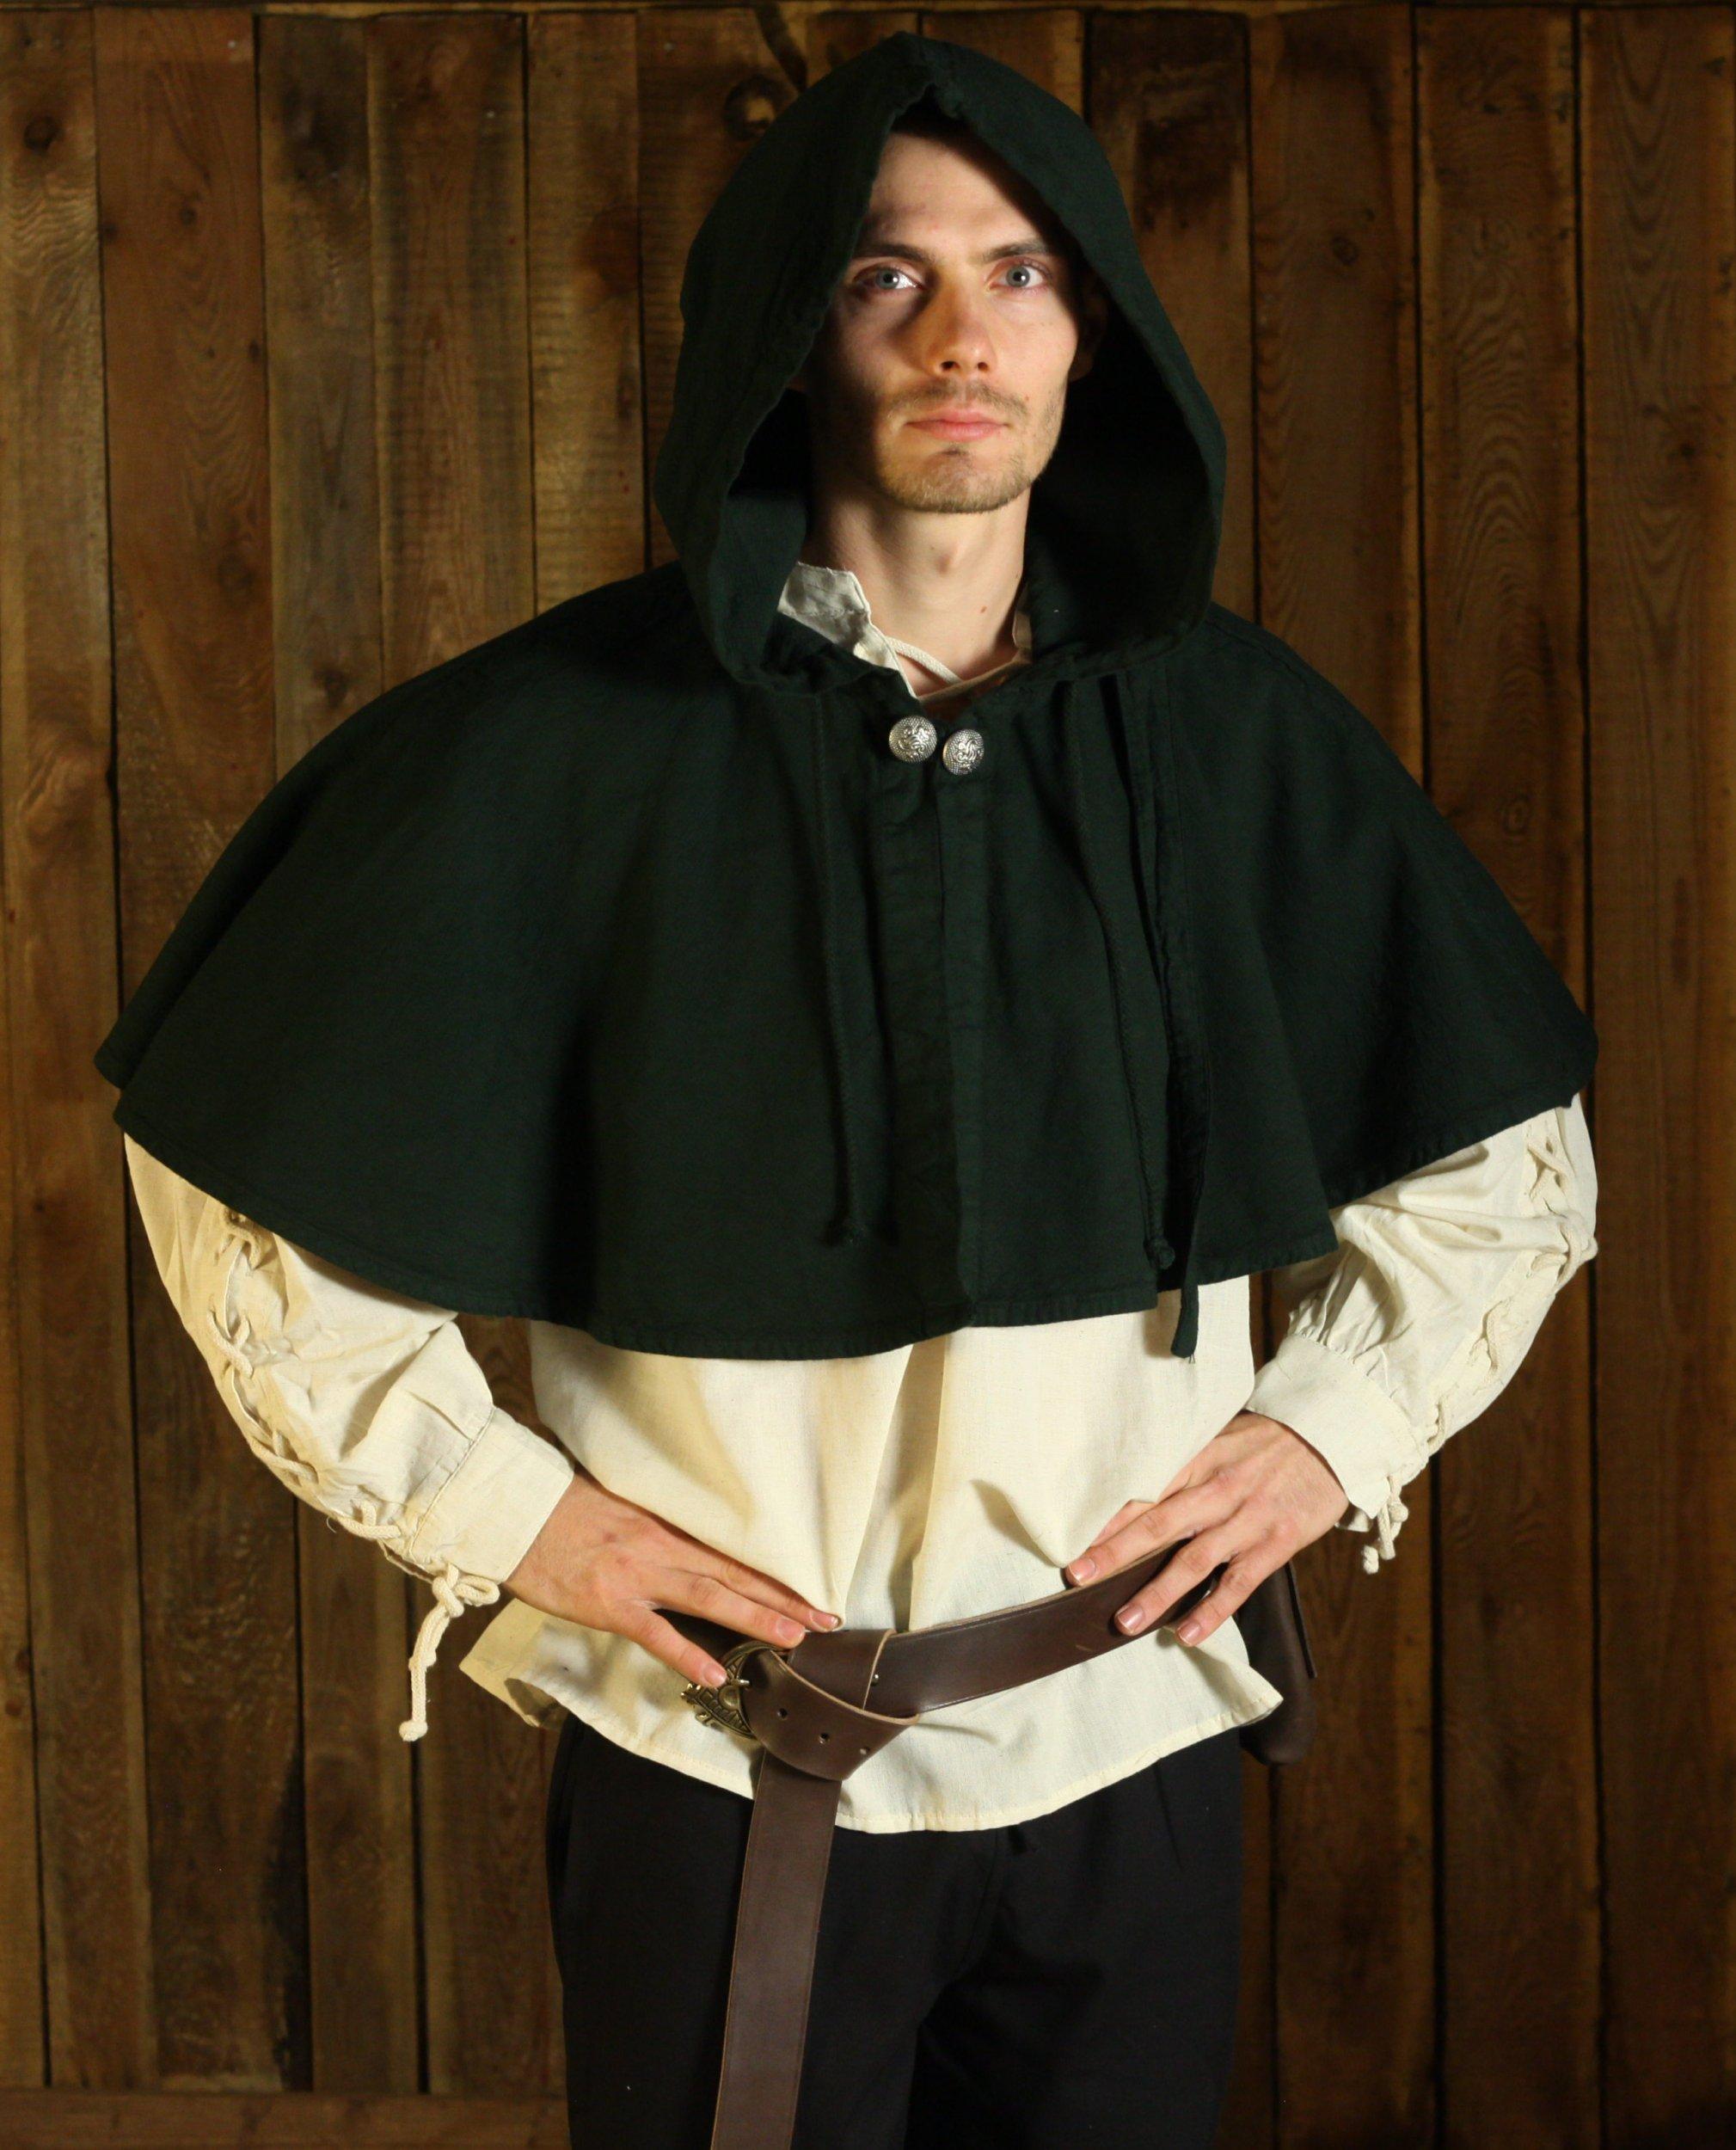 Kapuze für Larp RPG NEU GUGEL gewandung gothic mittelalter #5001 FARBWAHL